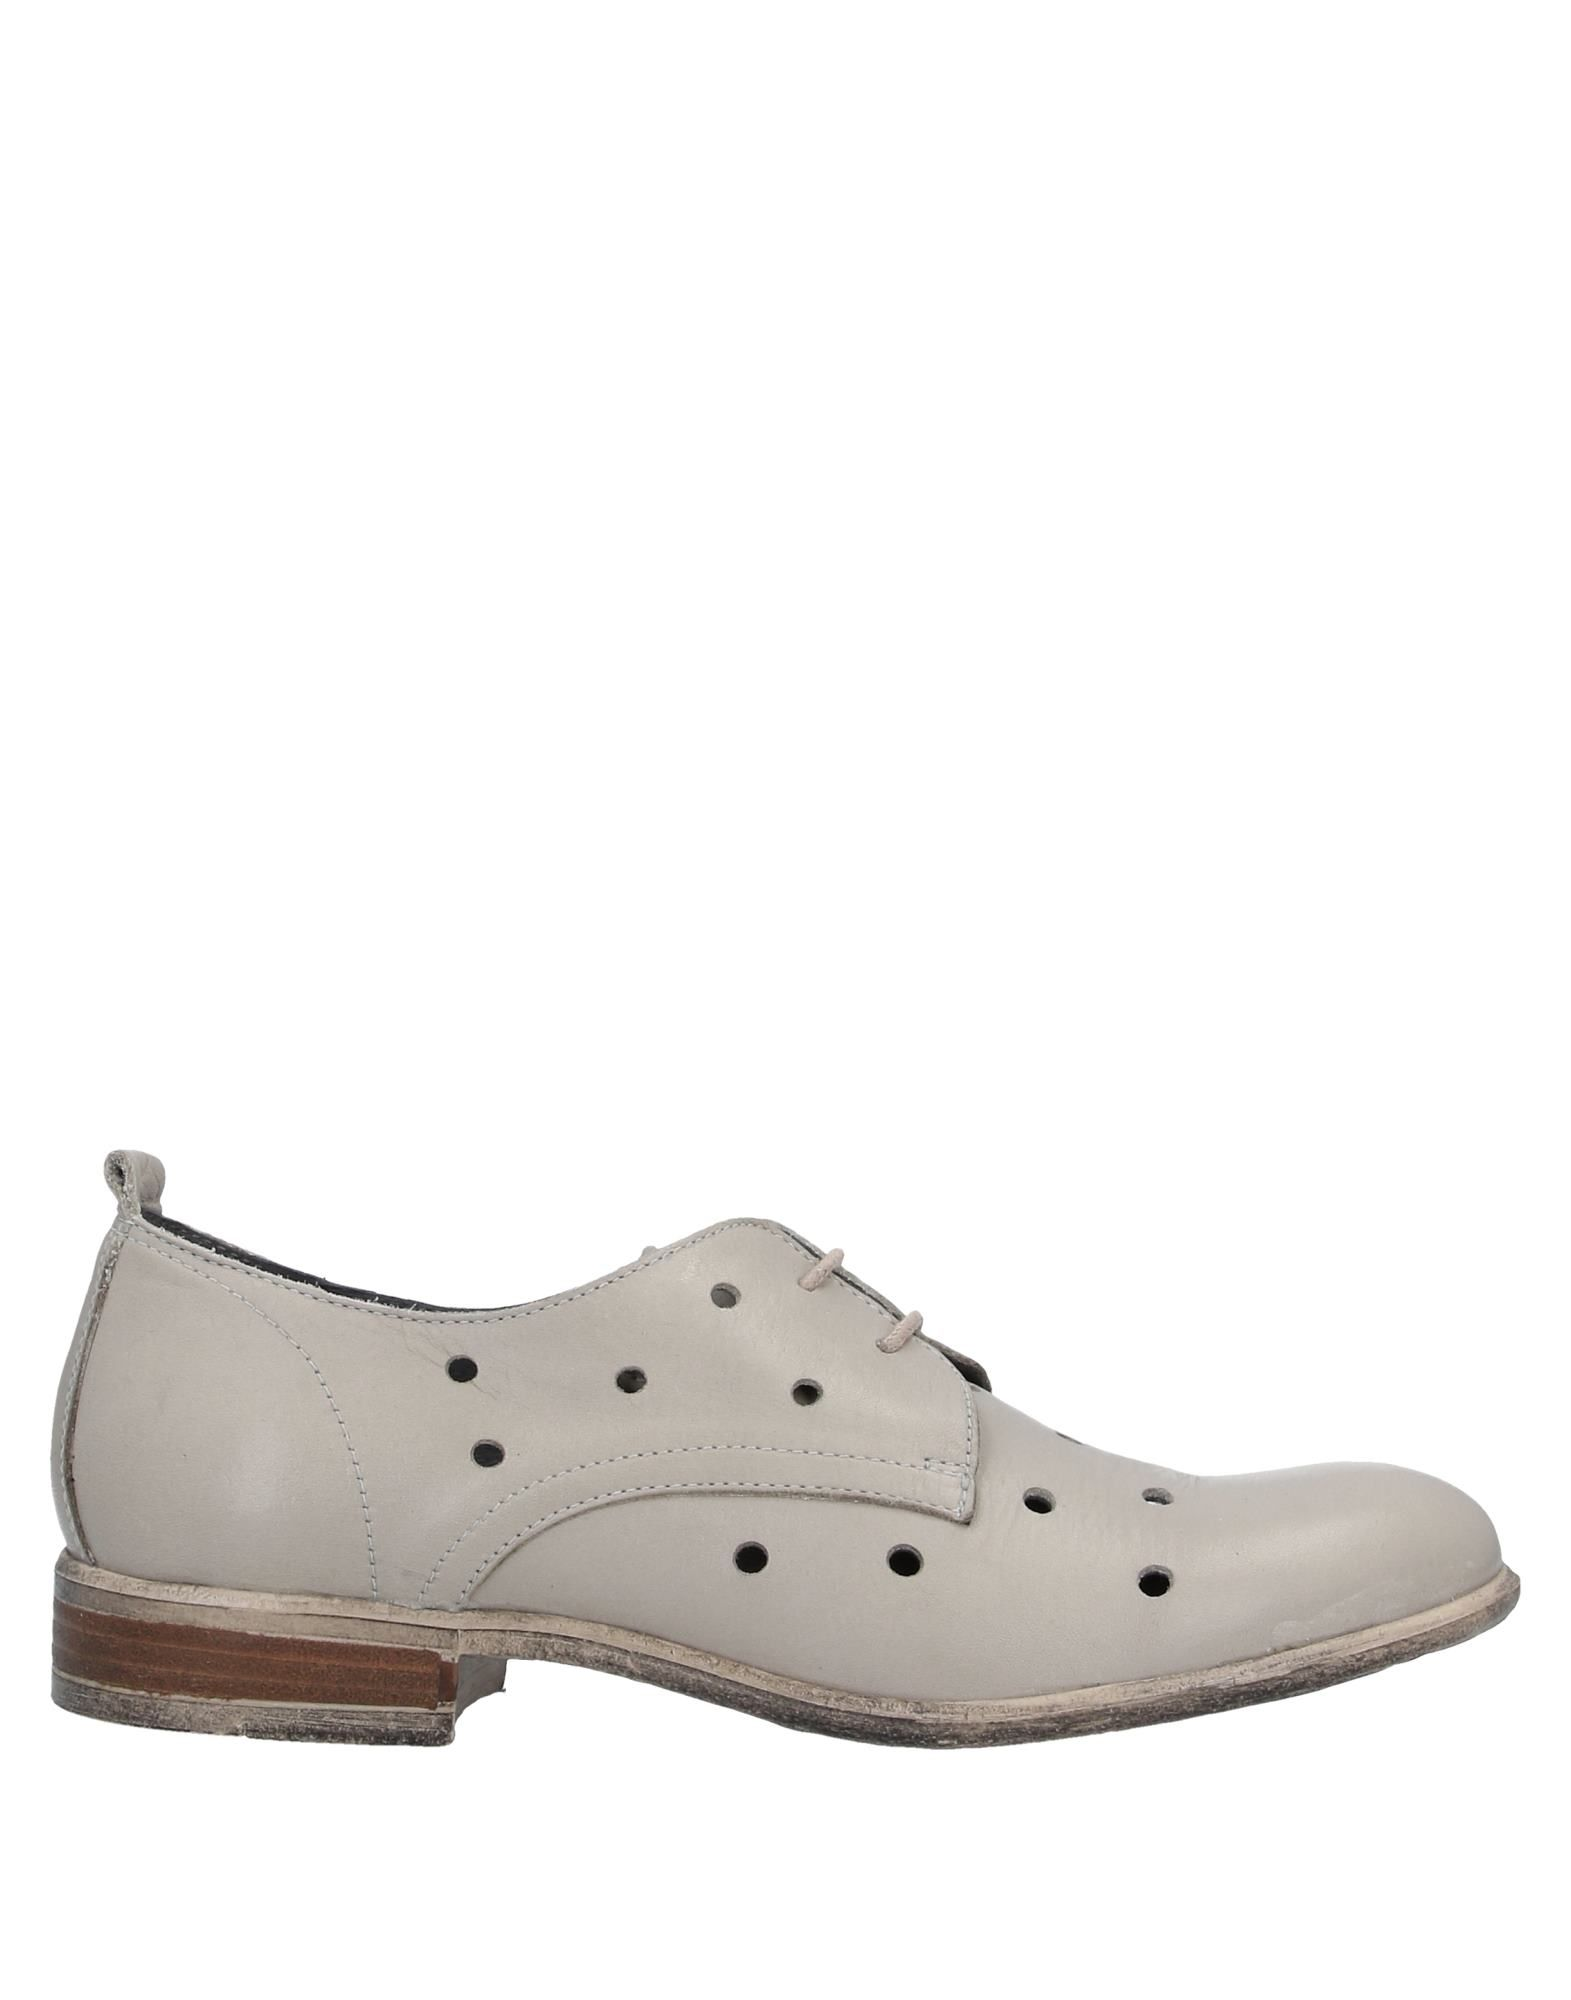 le blanc обувь на шнурках LE BOHÉMIEN Обувь на шнурках